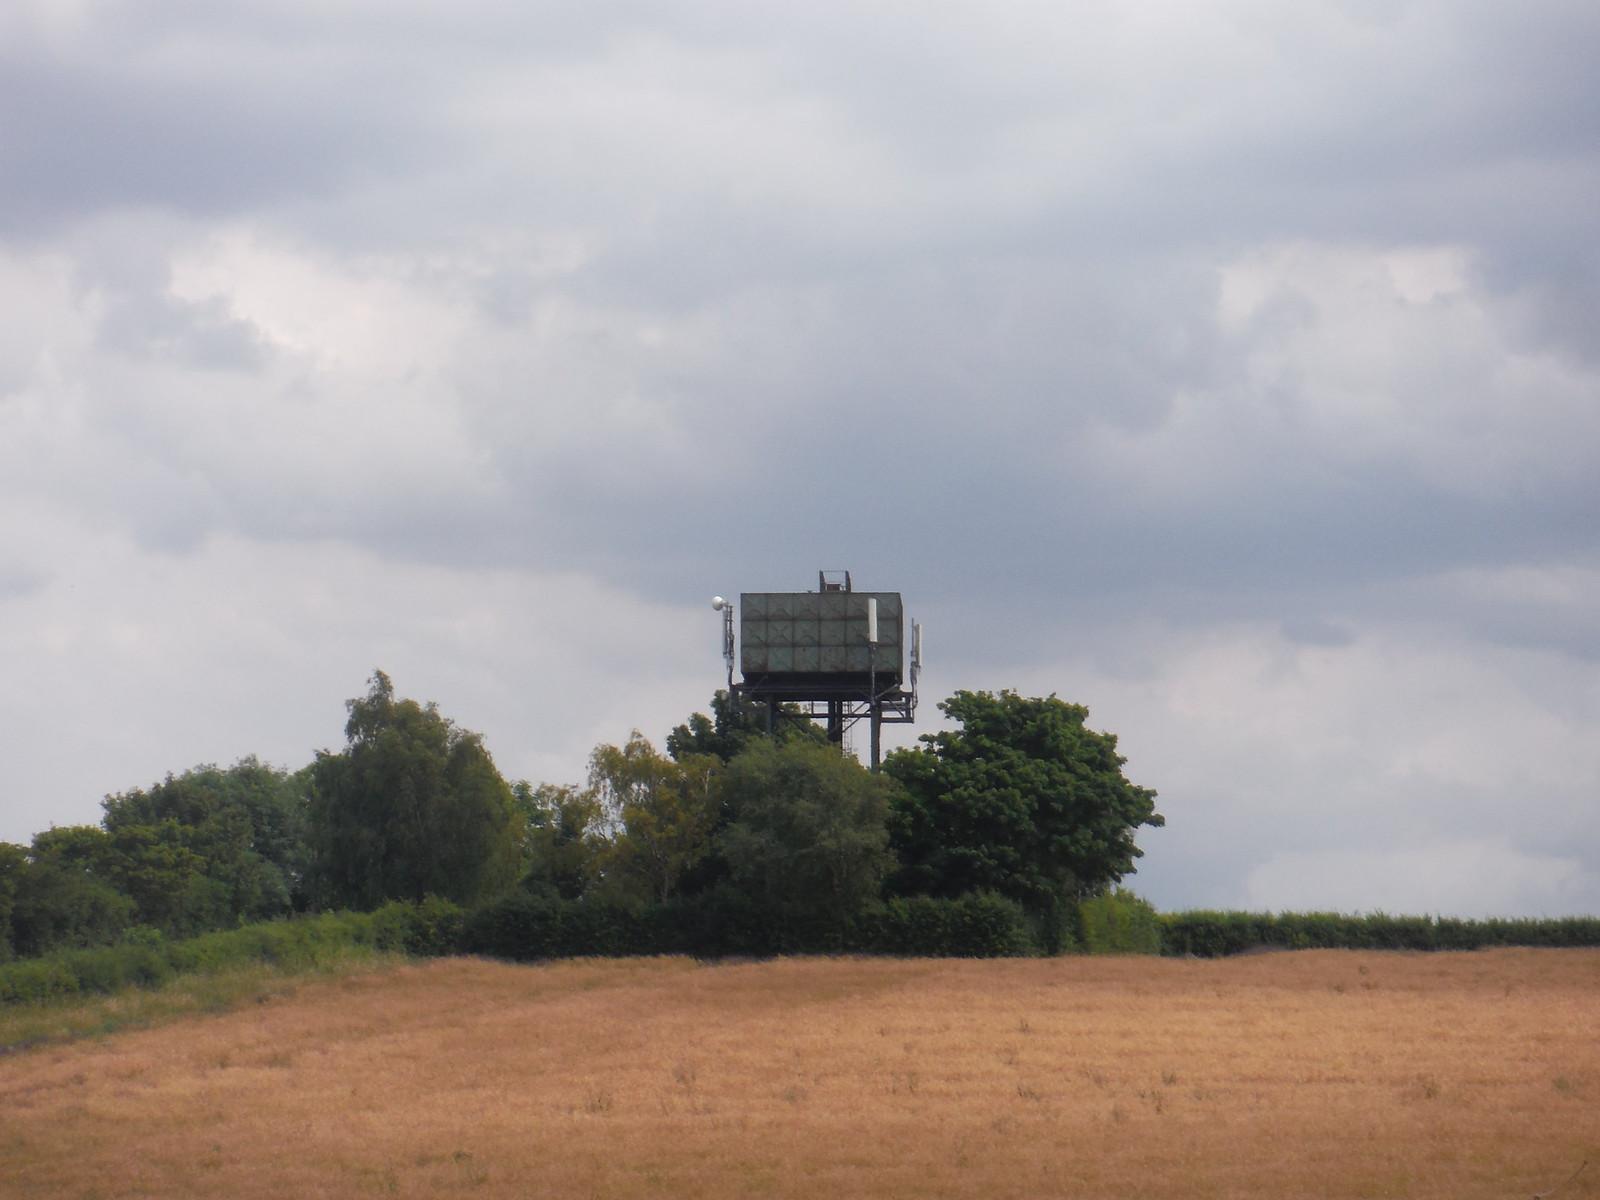 Pirton Water Tower SWC Walk 233 - Arlesey to Letchworth Garden City